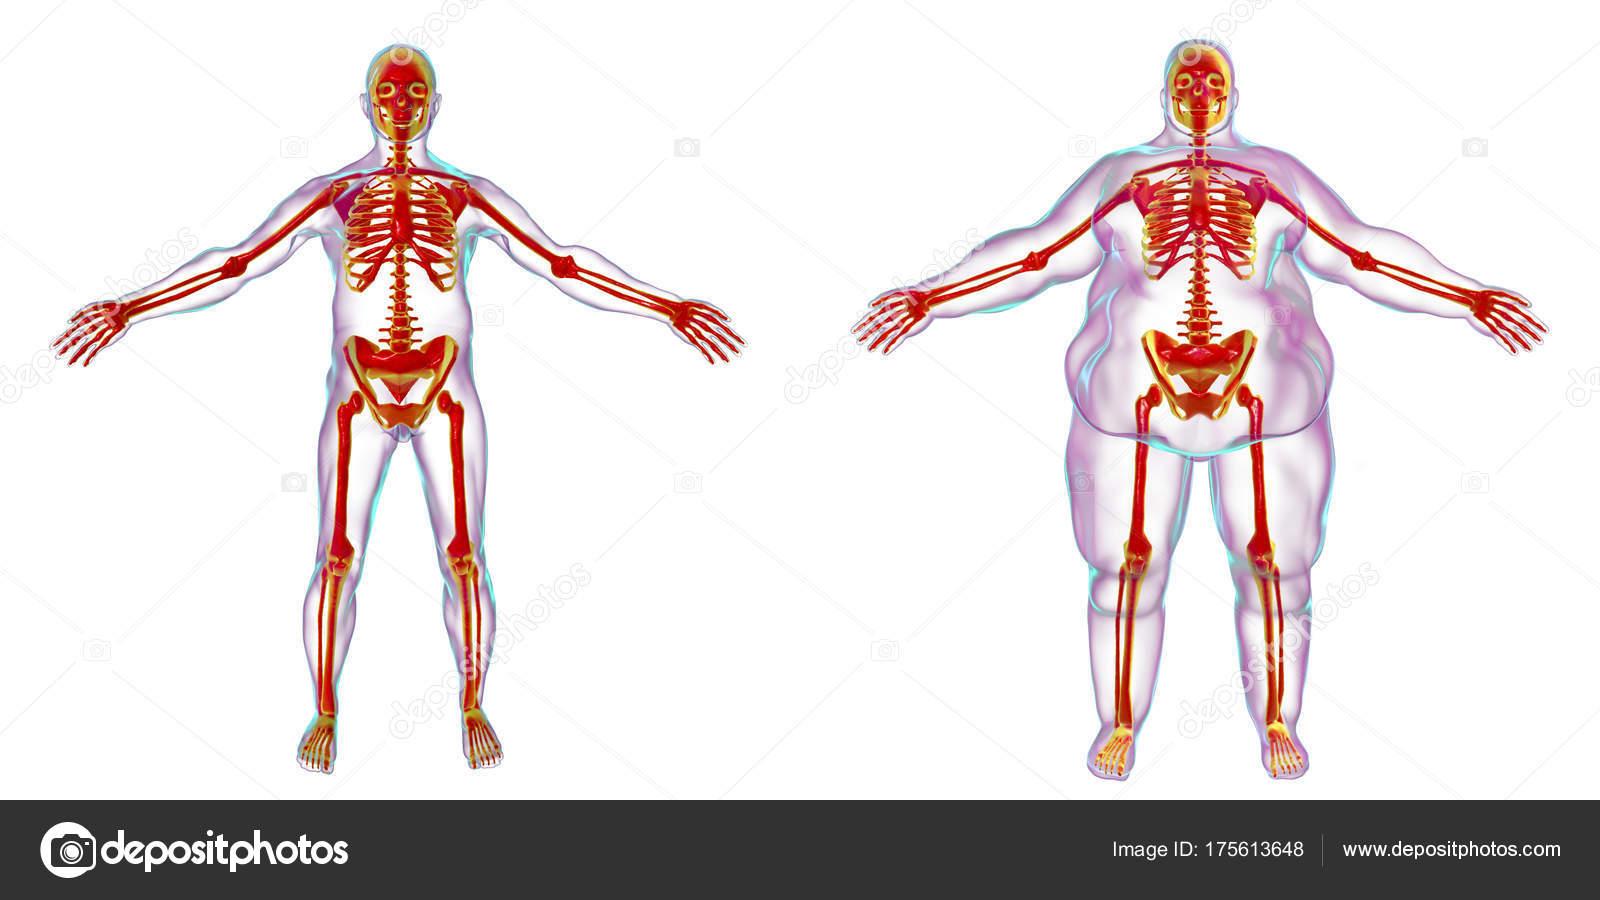 Fettleibigkeit Problem Konzeptbild — Stockfoto © katerynakon #175613648